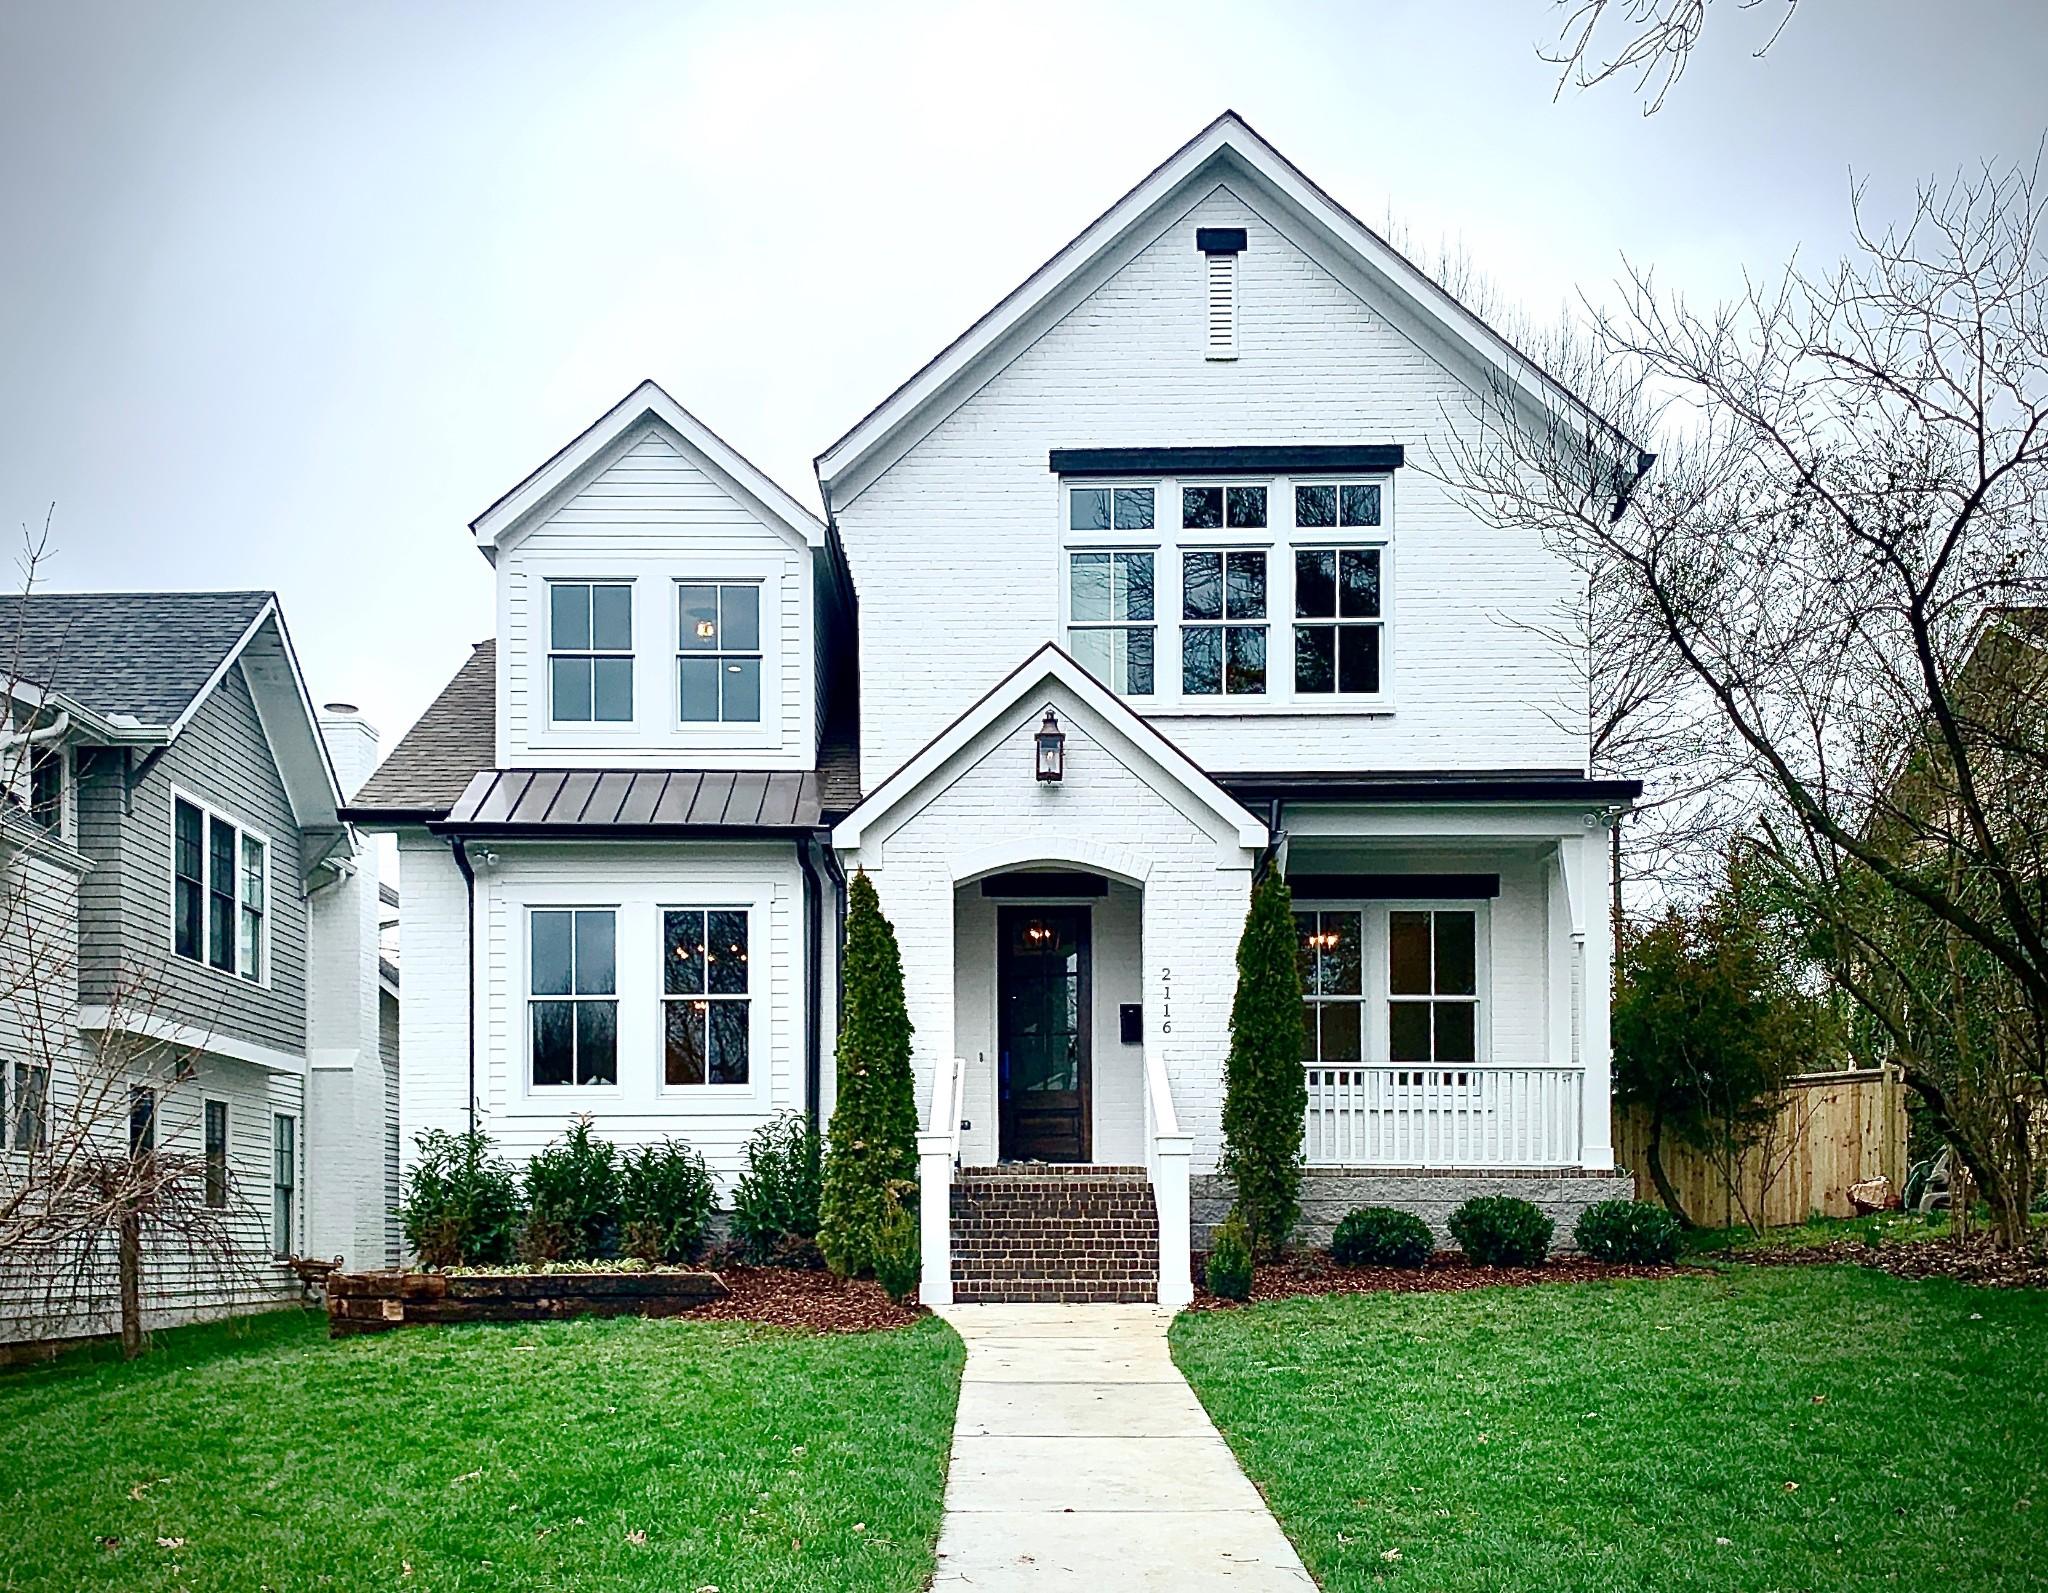 2116 19th Ave , S, Nashville, TN 37212 - Nashville, TN real estate listing